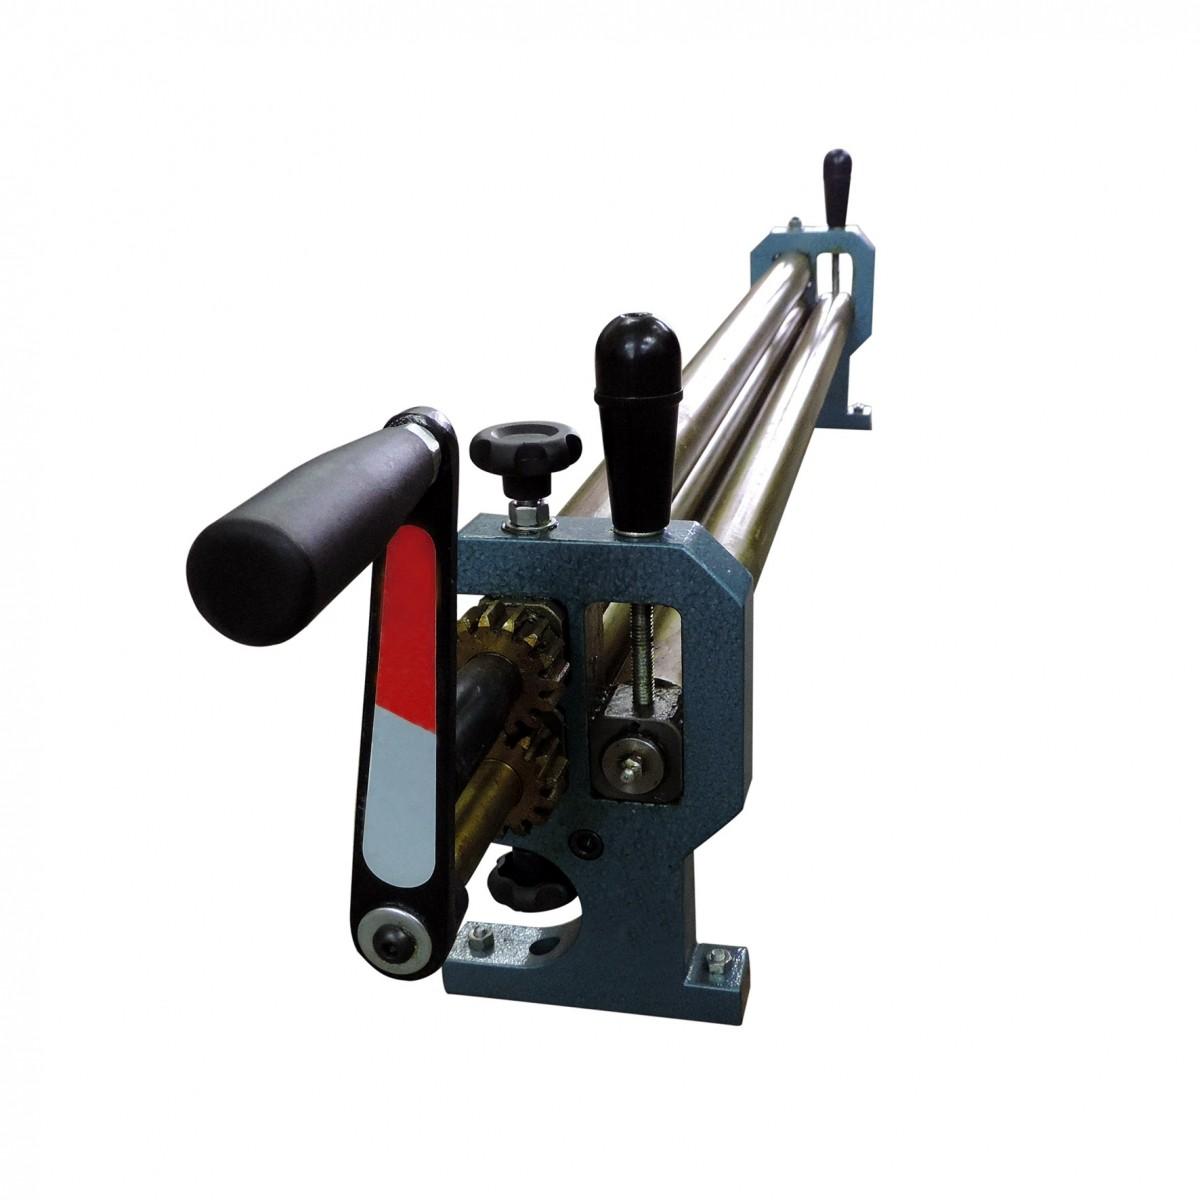 Calandra Inicial Manual - 1025 x 1mm - Sem Bancada - Vega